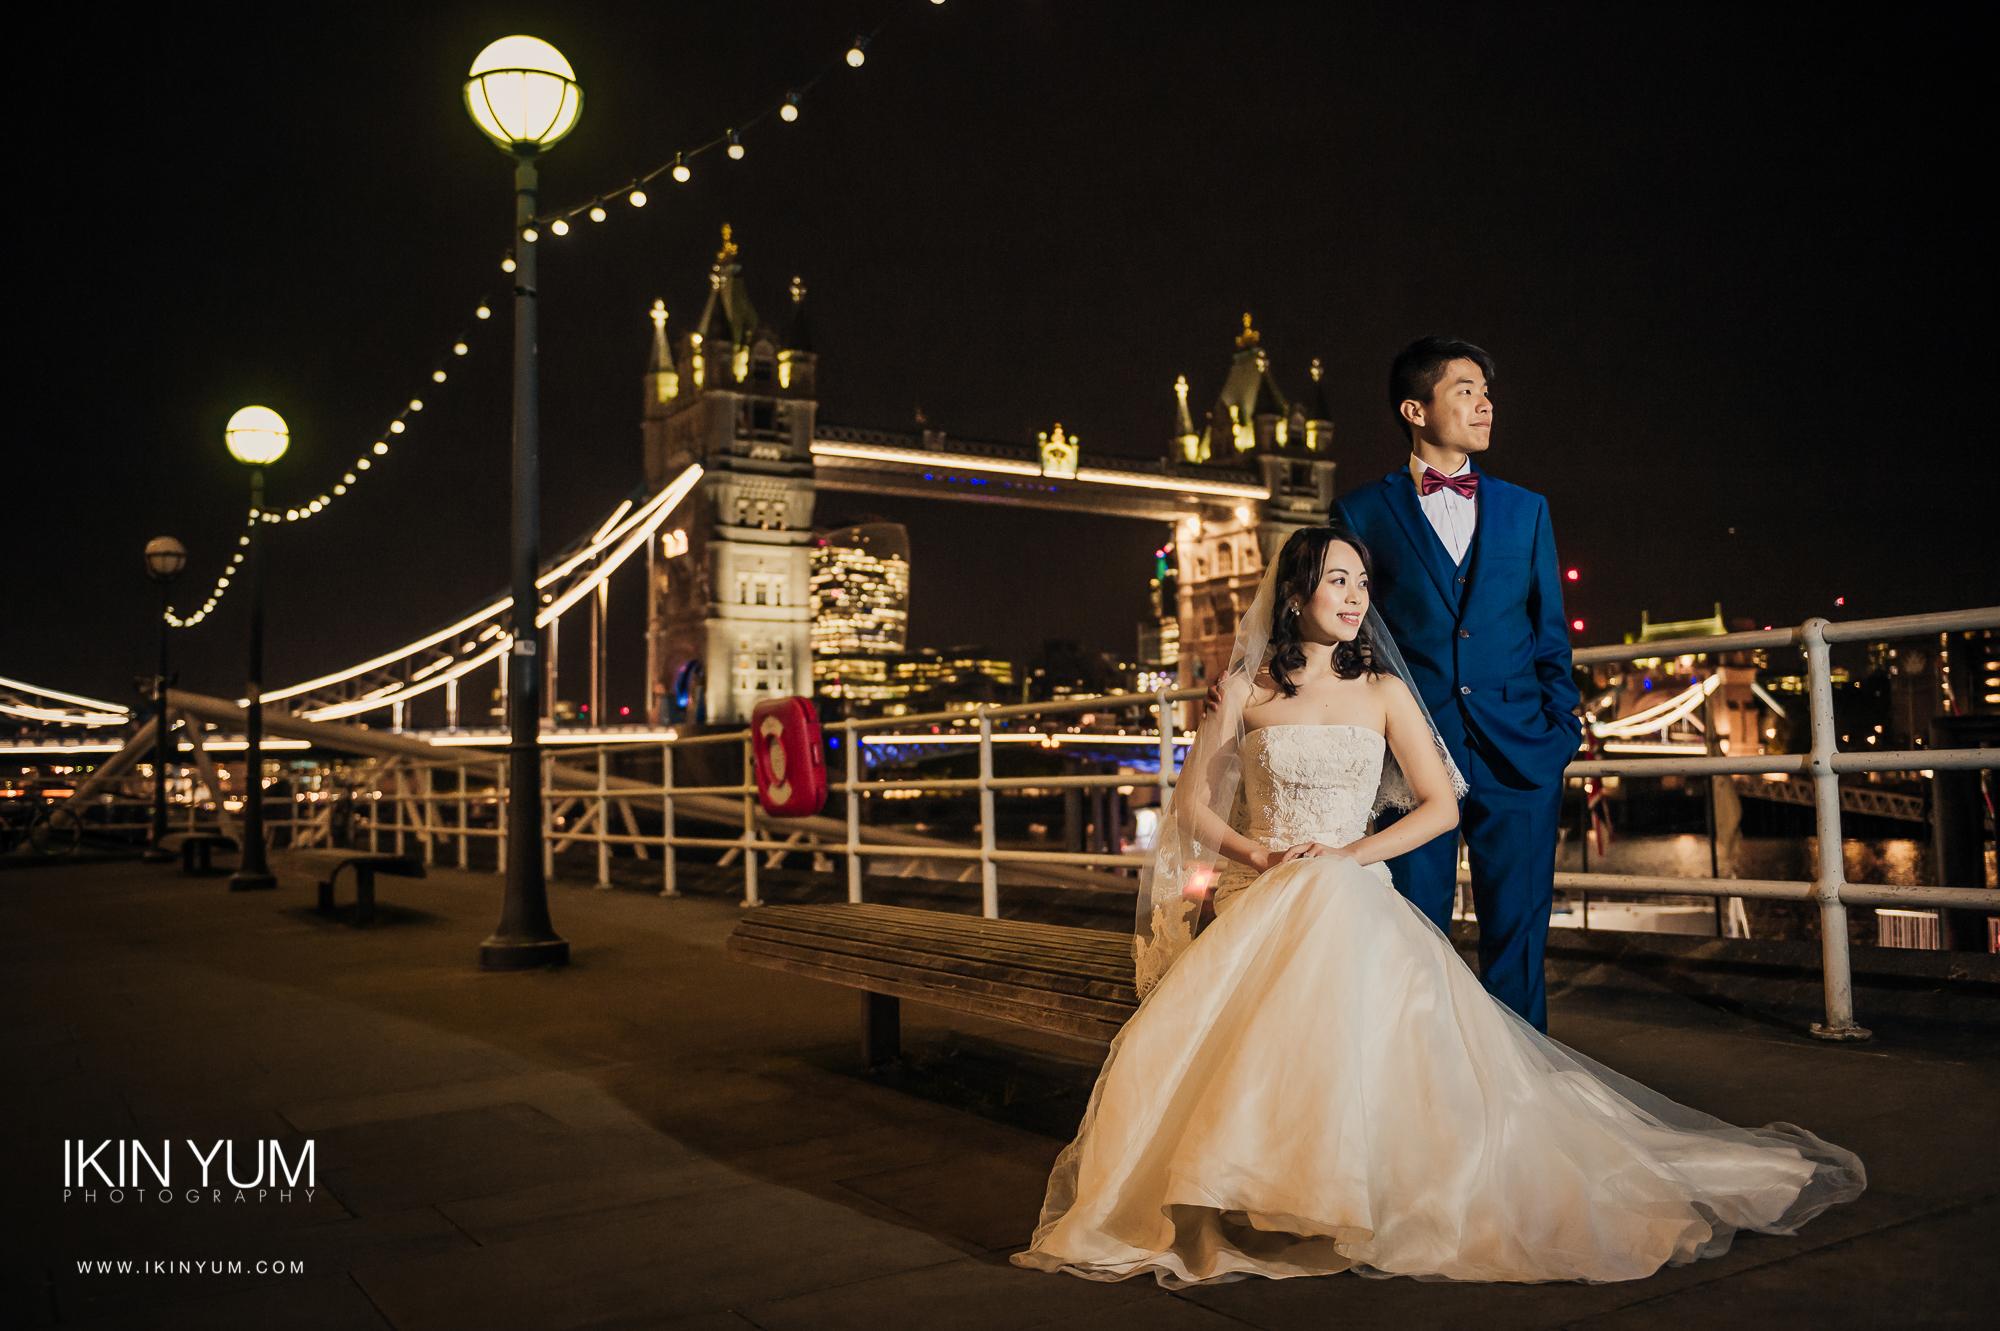 Chloe & Carlos Pre-Wedding Shoot- Ikin Yum Photography-0152.jpg